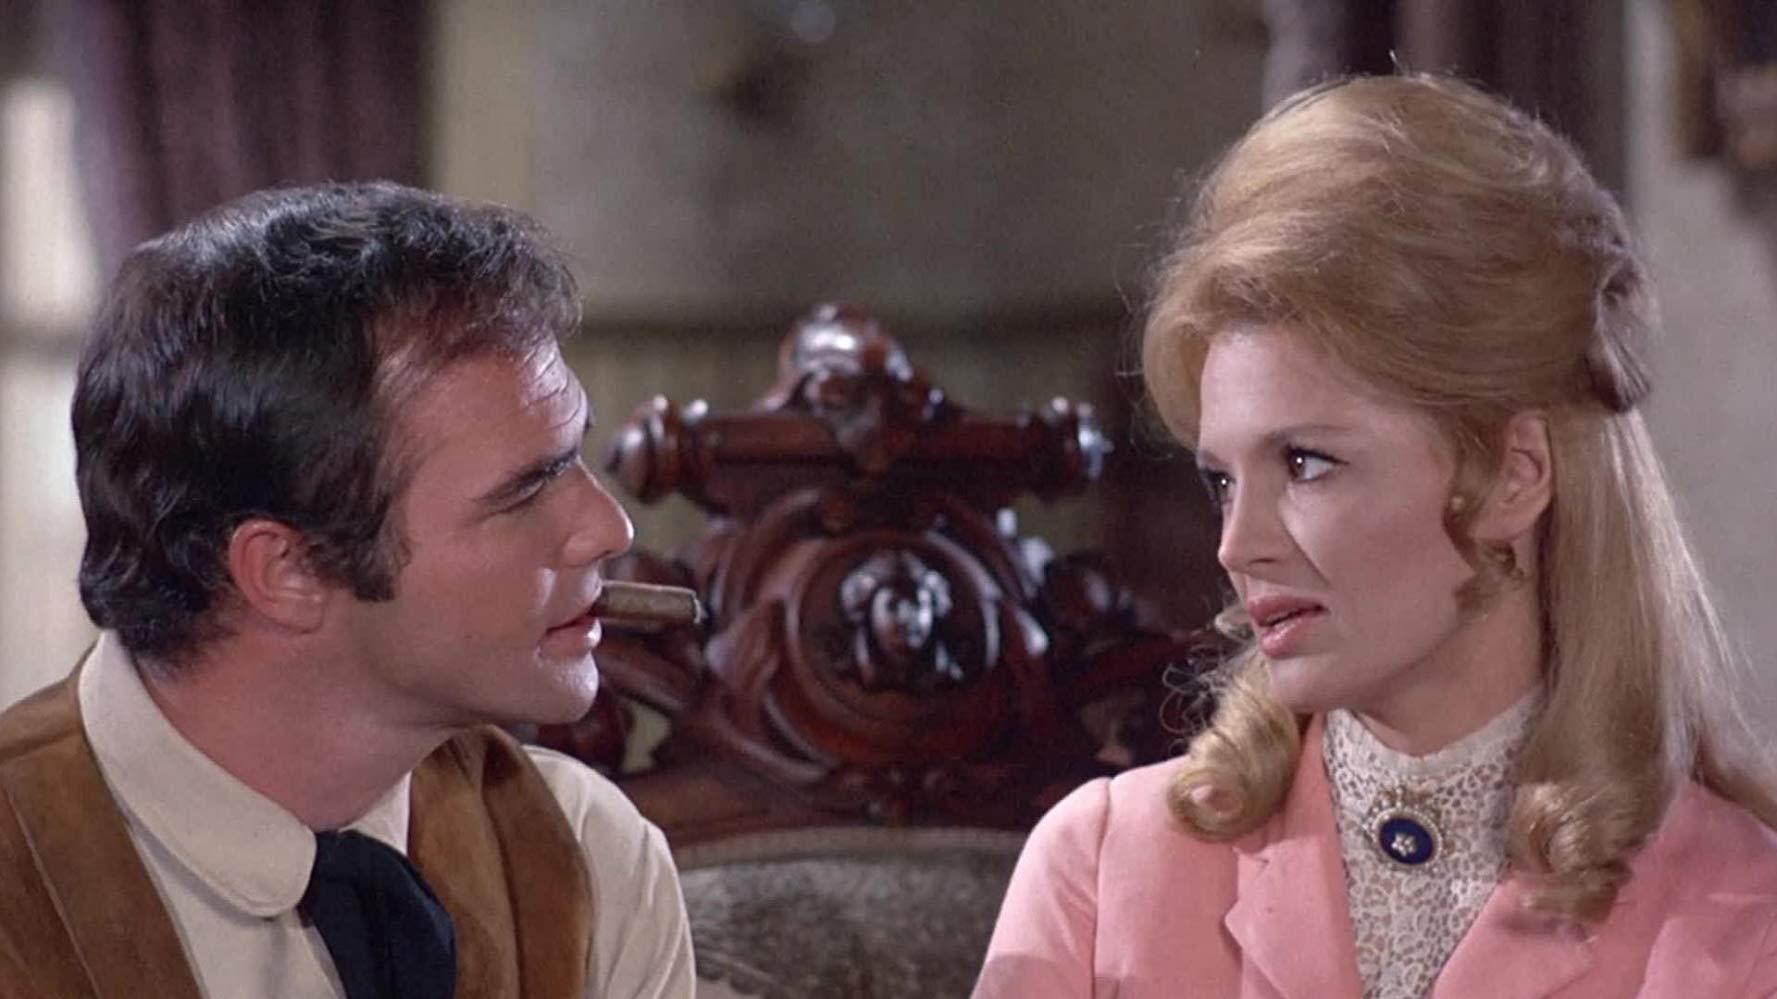 Burt Reynolds Angie Dickinson Sam Whiskey 1969 western comedy